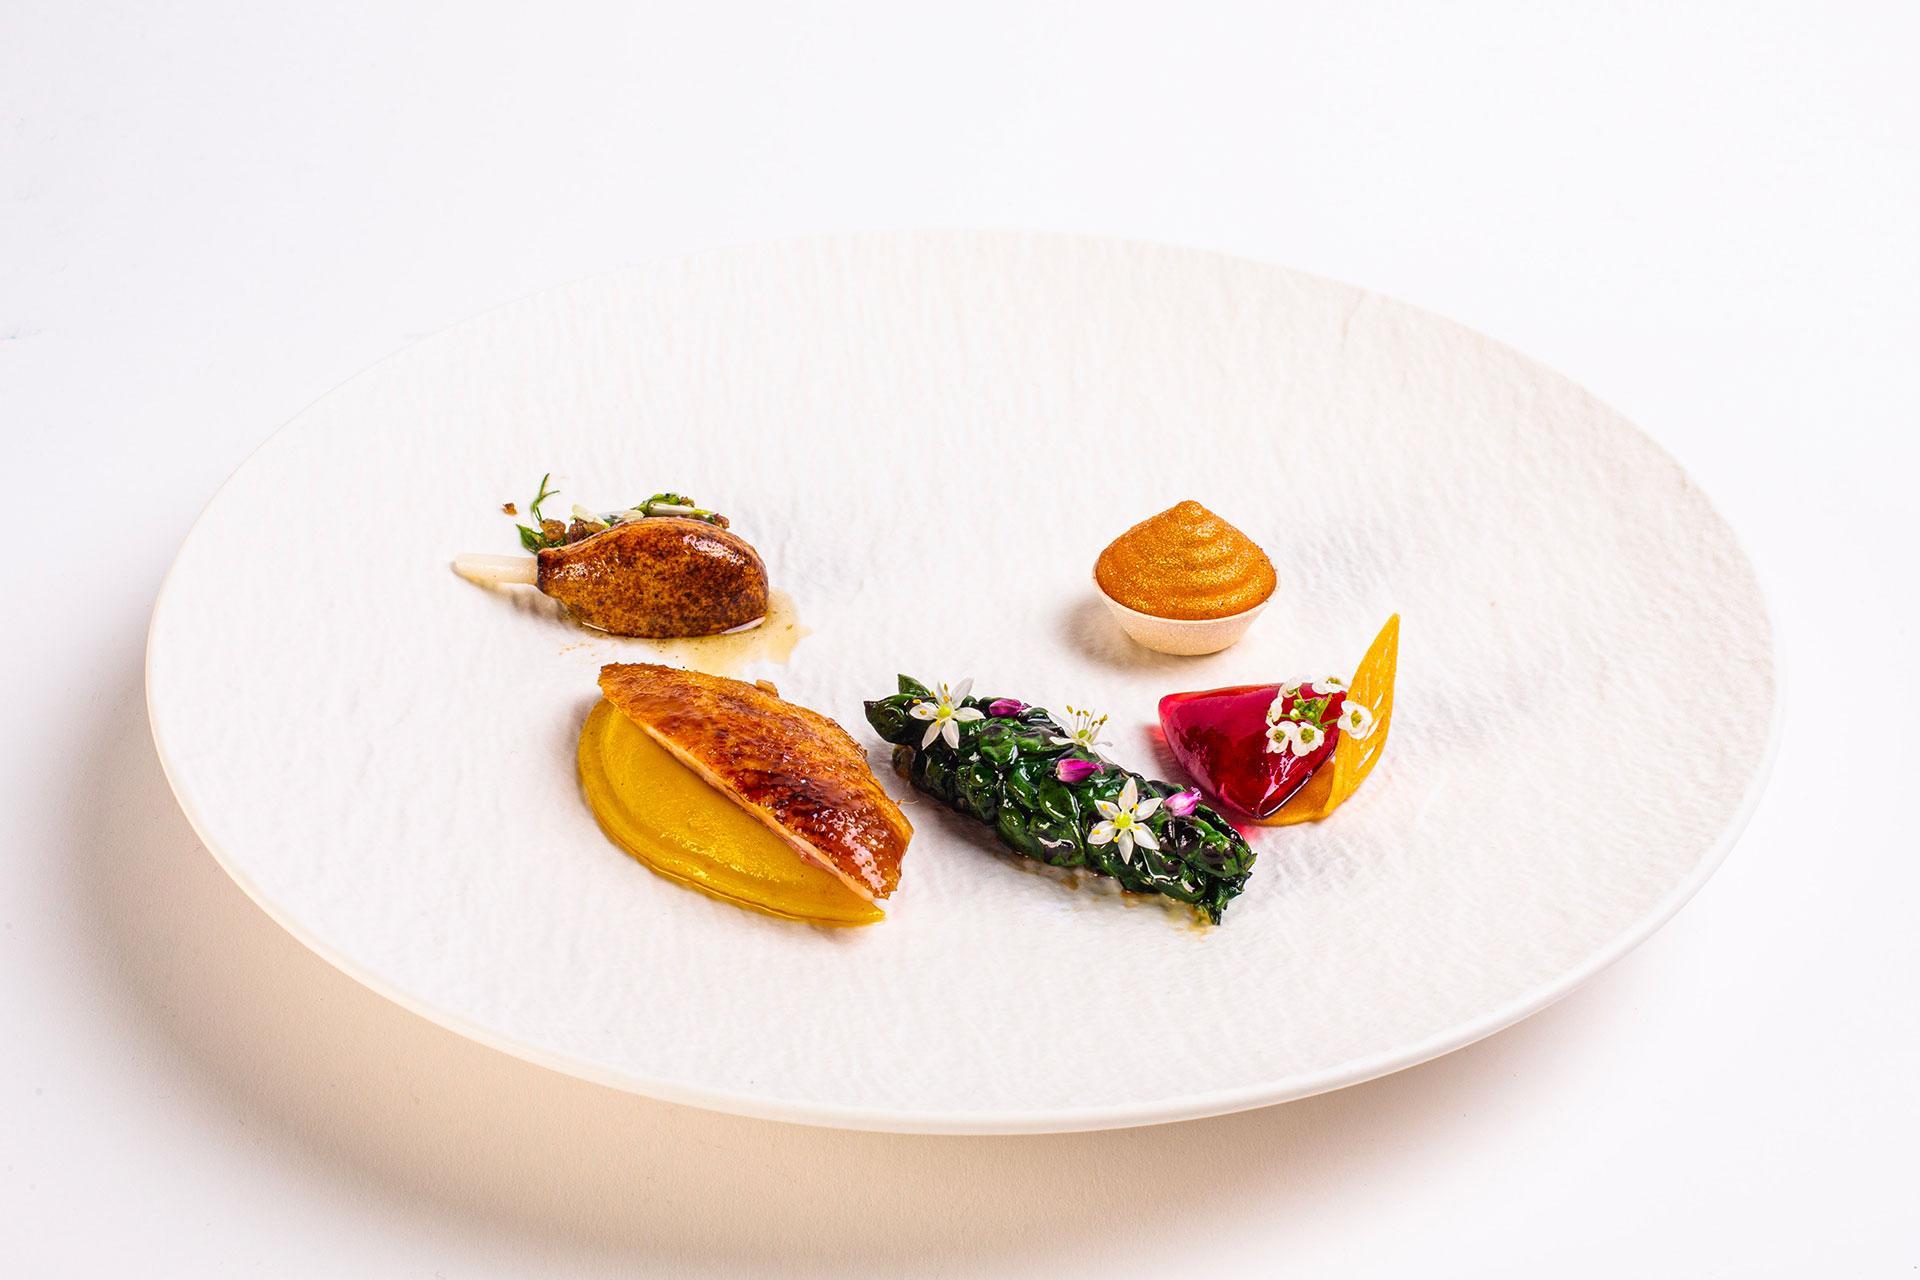 Winning dish Bocuse d'Or 2020 - Norway